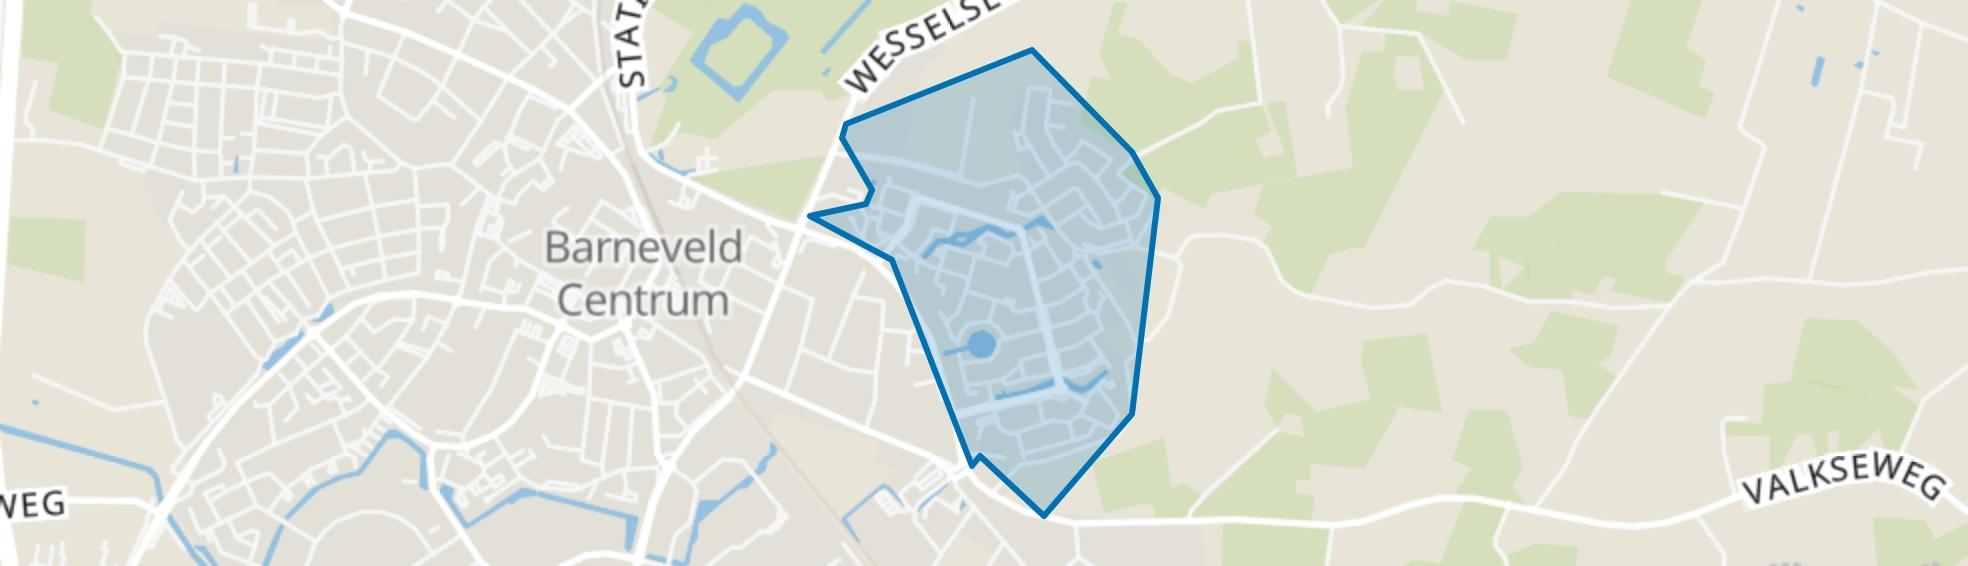 Norschoten, Barneveld map